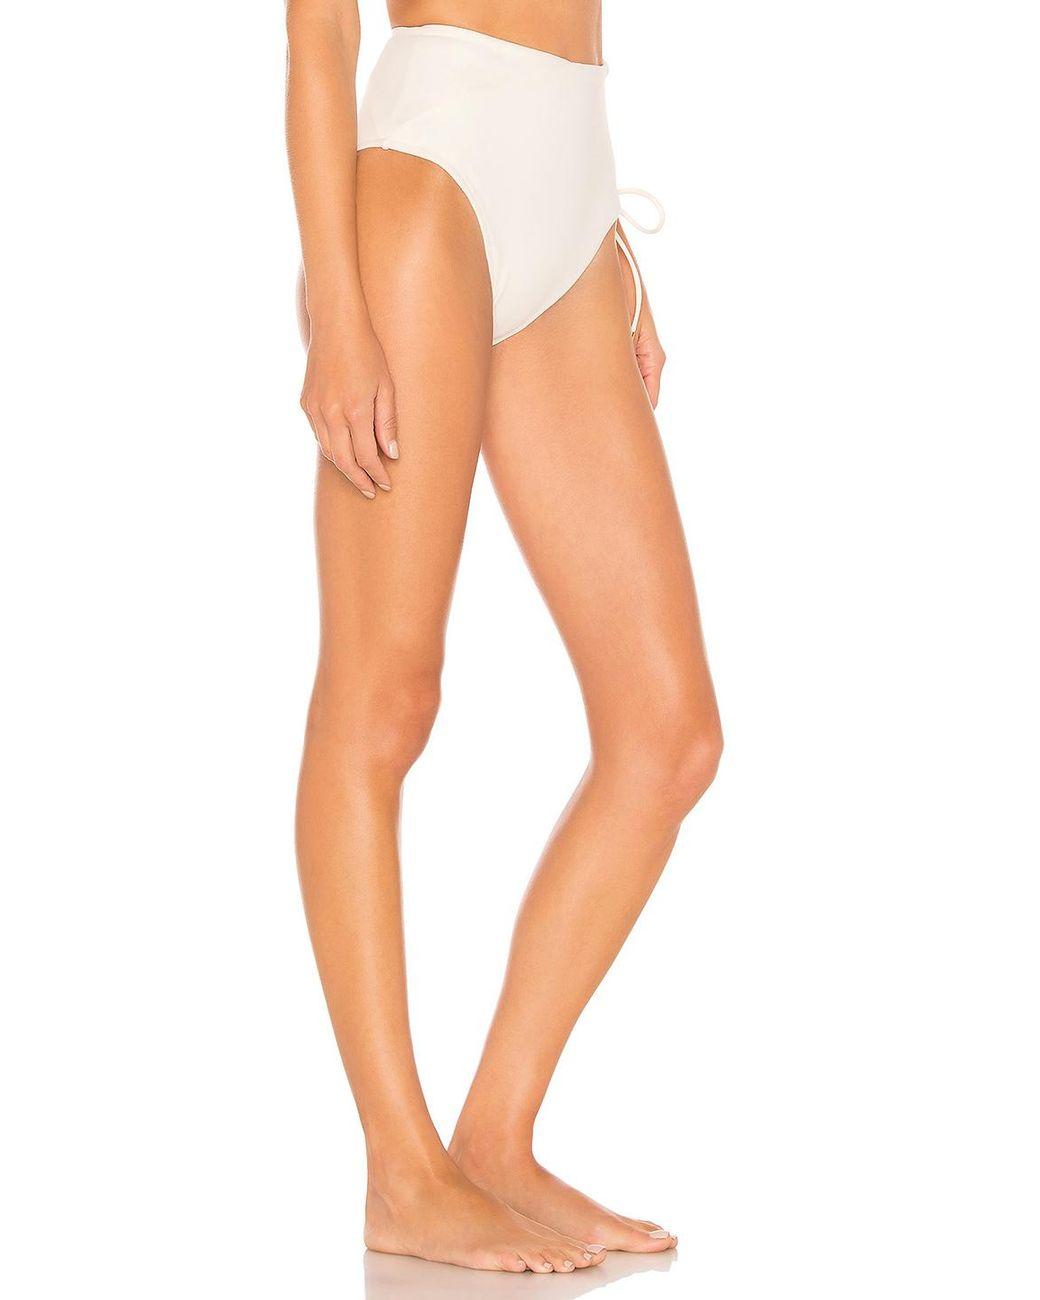 413c5718c974f Kopper & Zink Romeo Bikini Bottom - Lyst